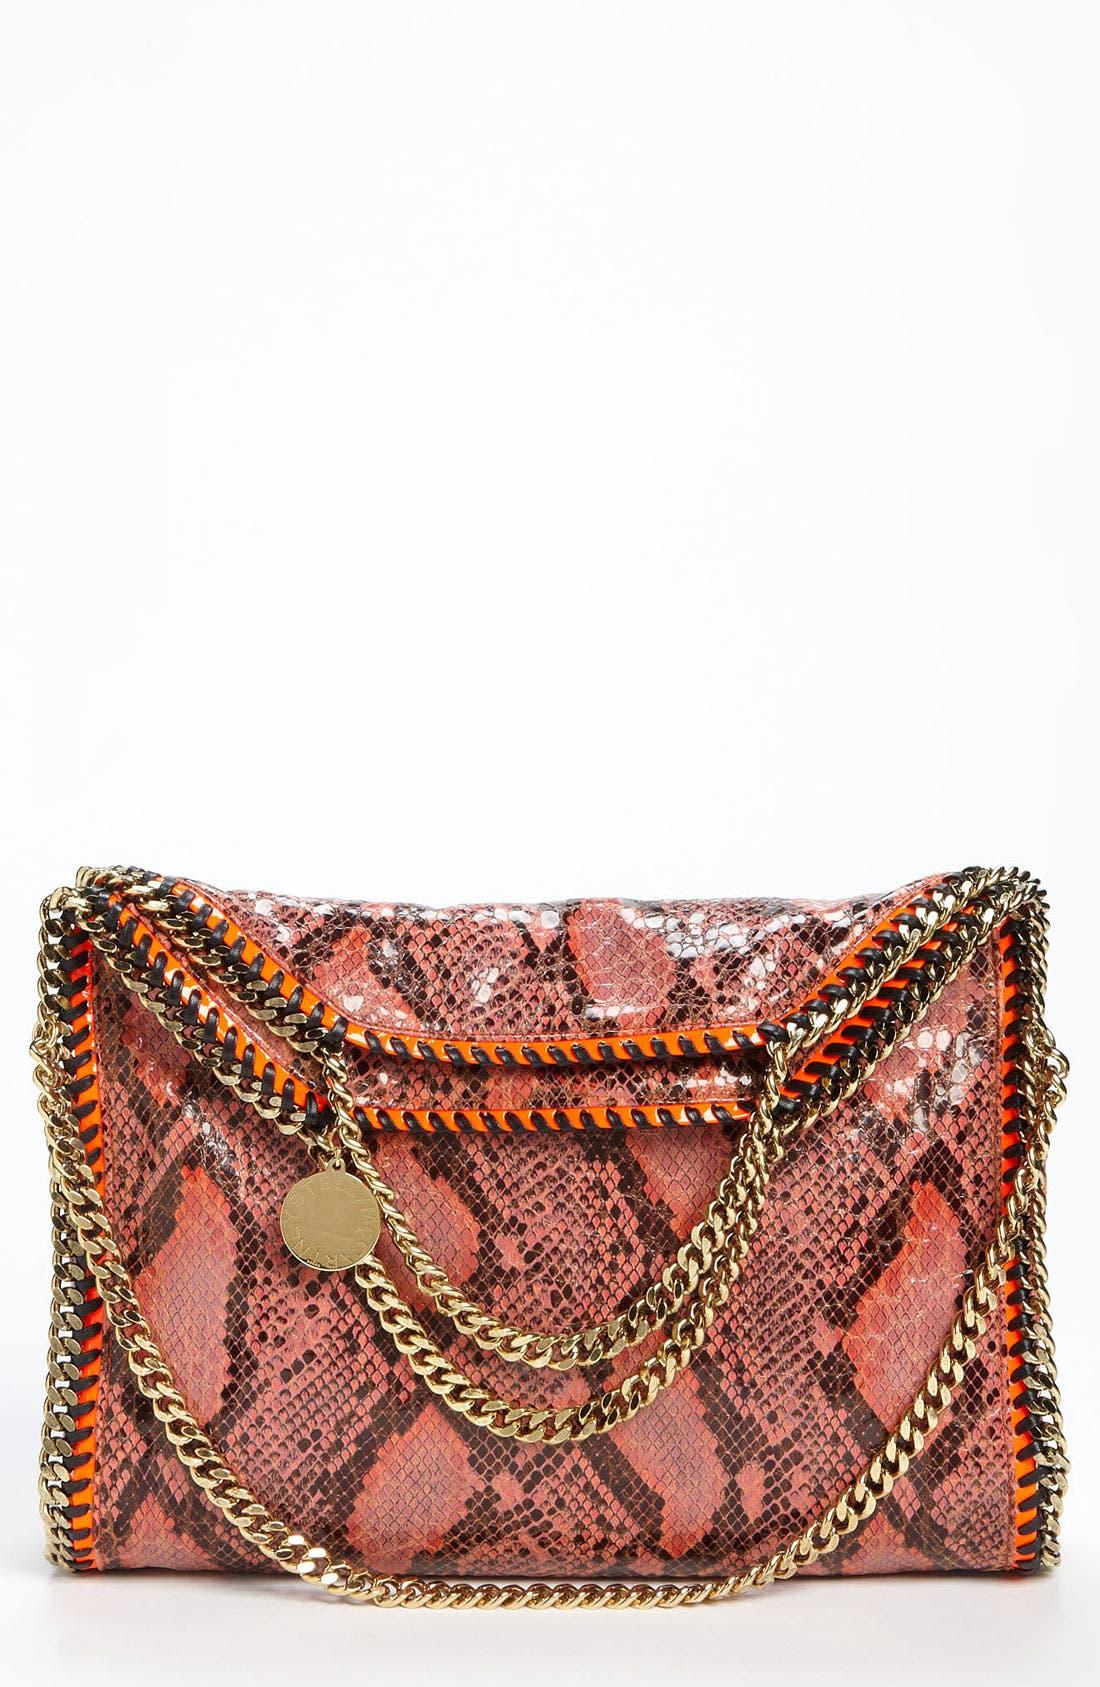 Main Image - Stella McCartney 'Falabella' Faux Python Handbag